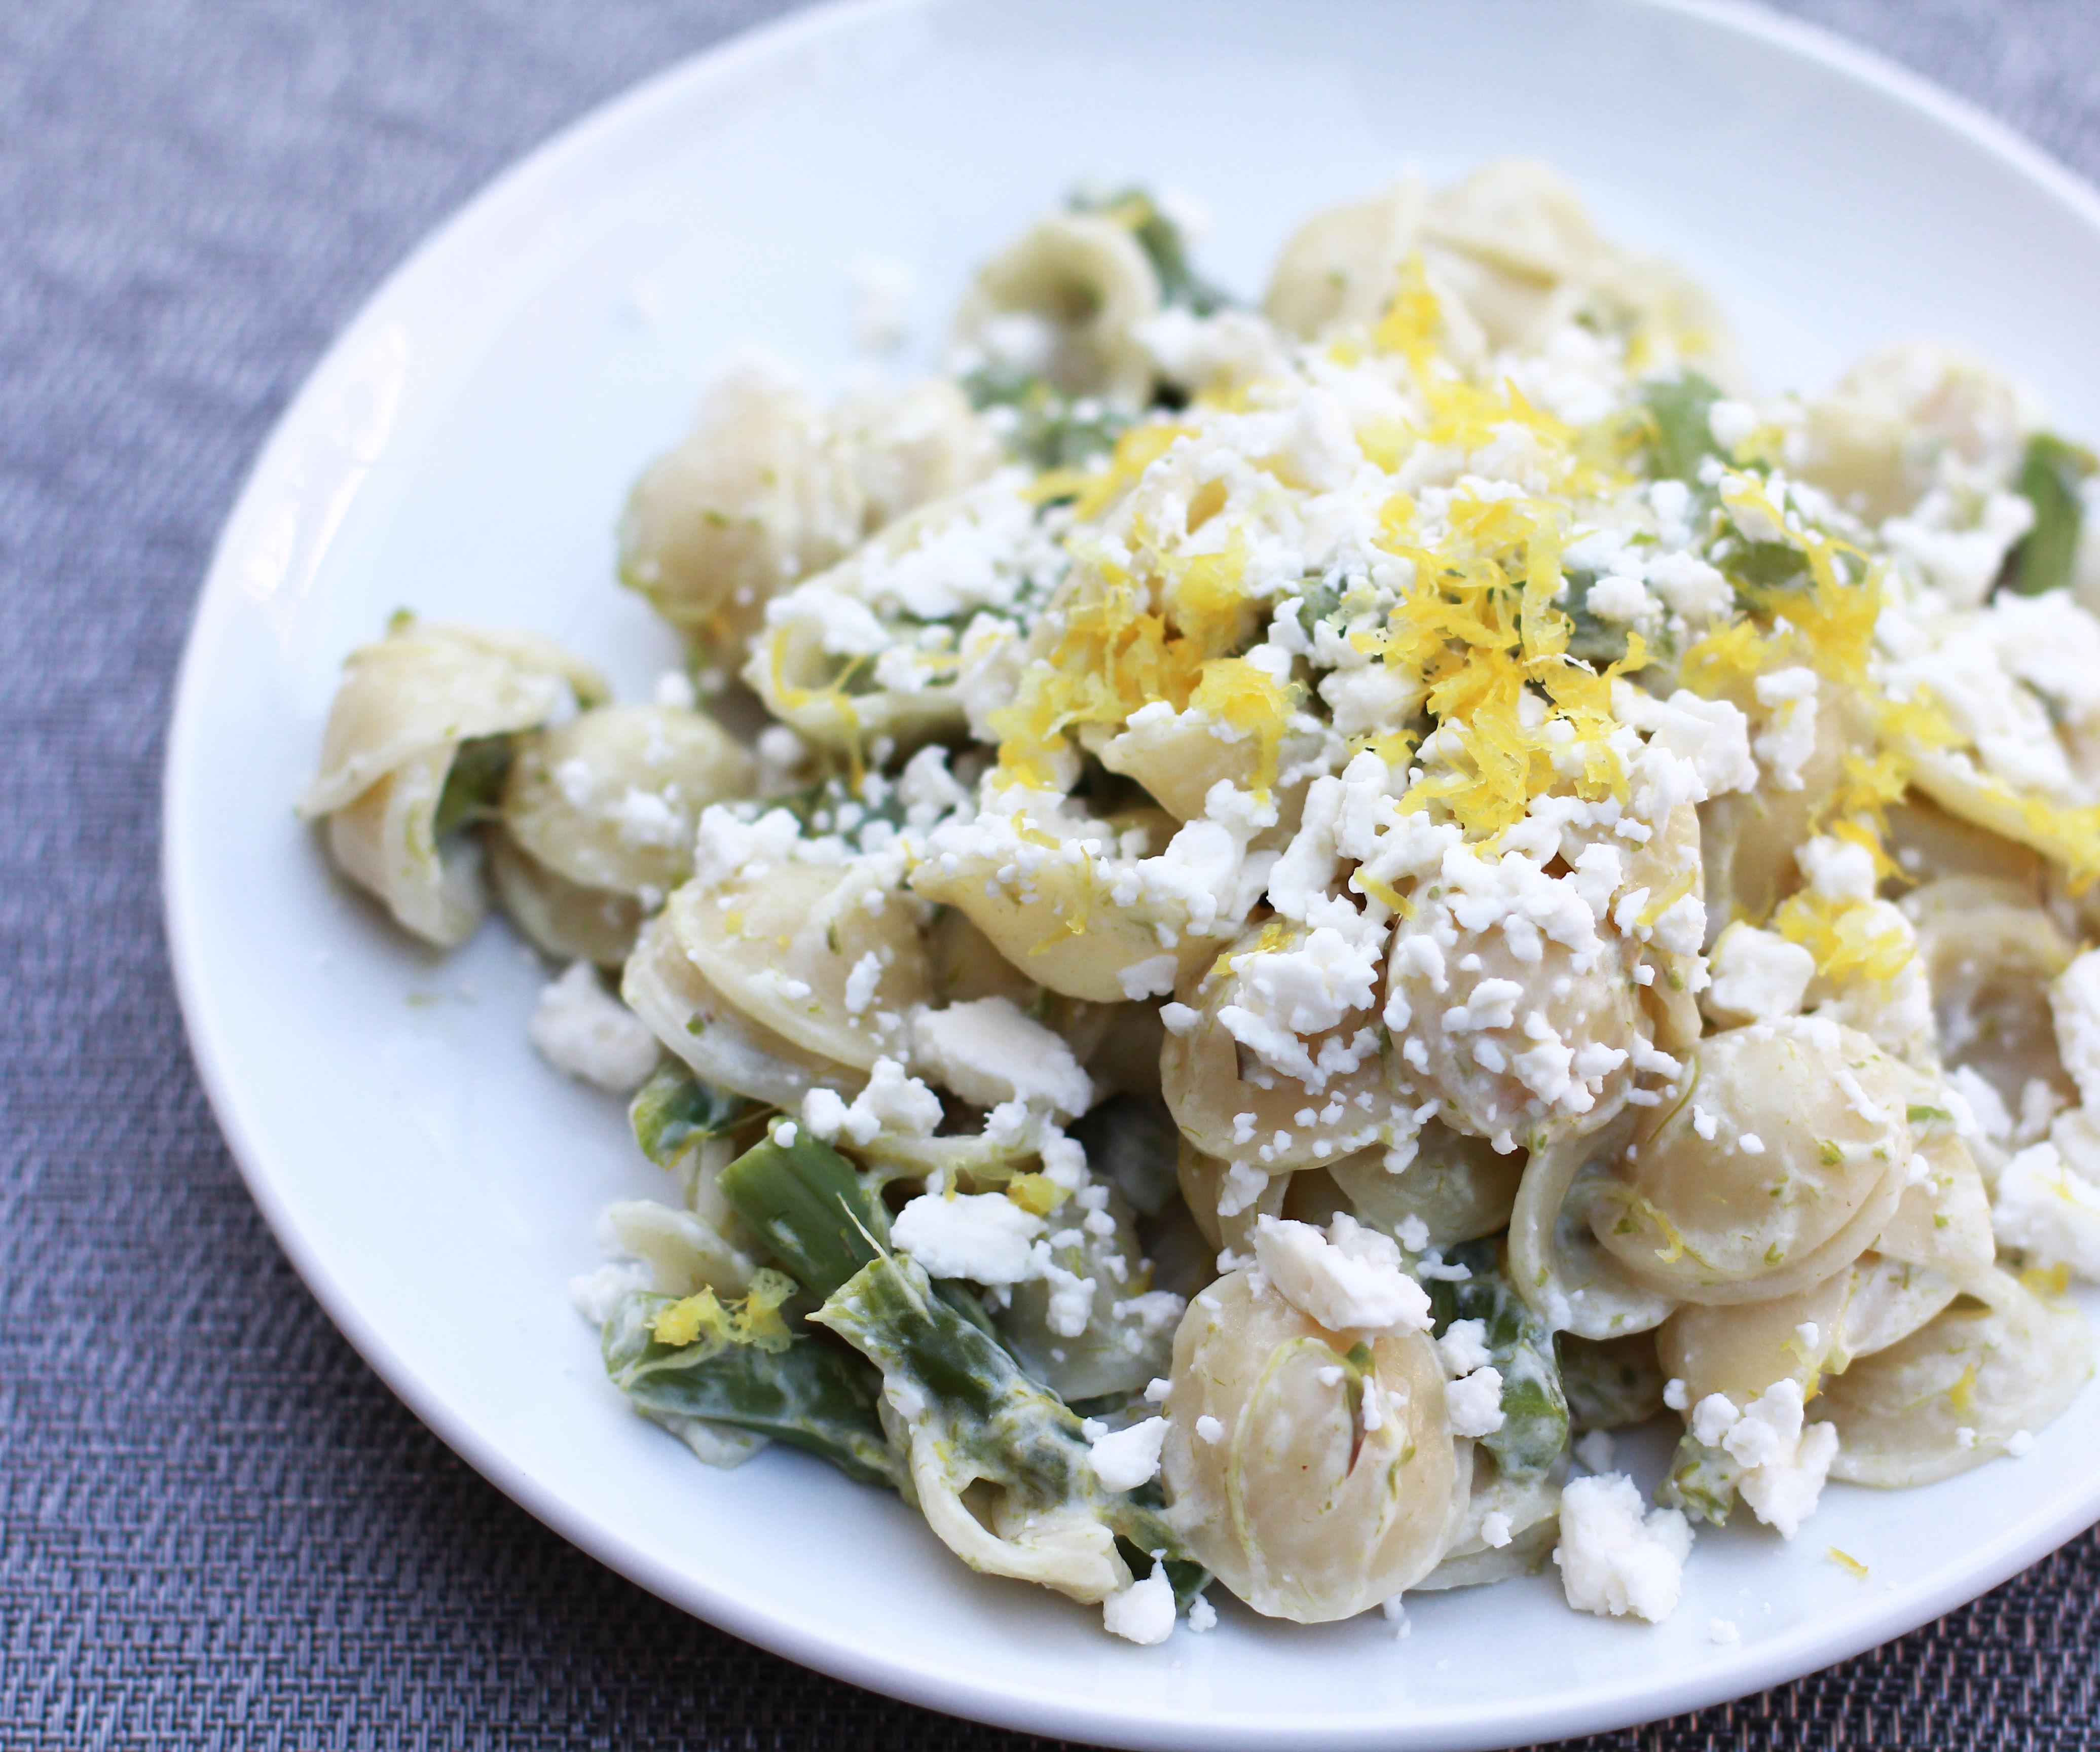 Pasta with Asparagus, Lemon, and Feta